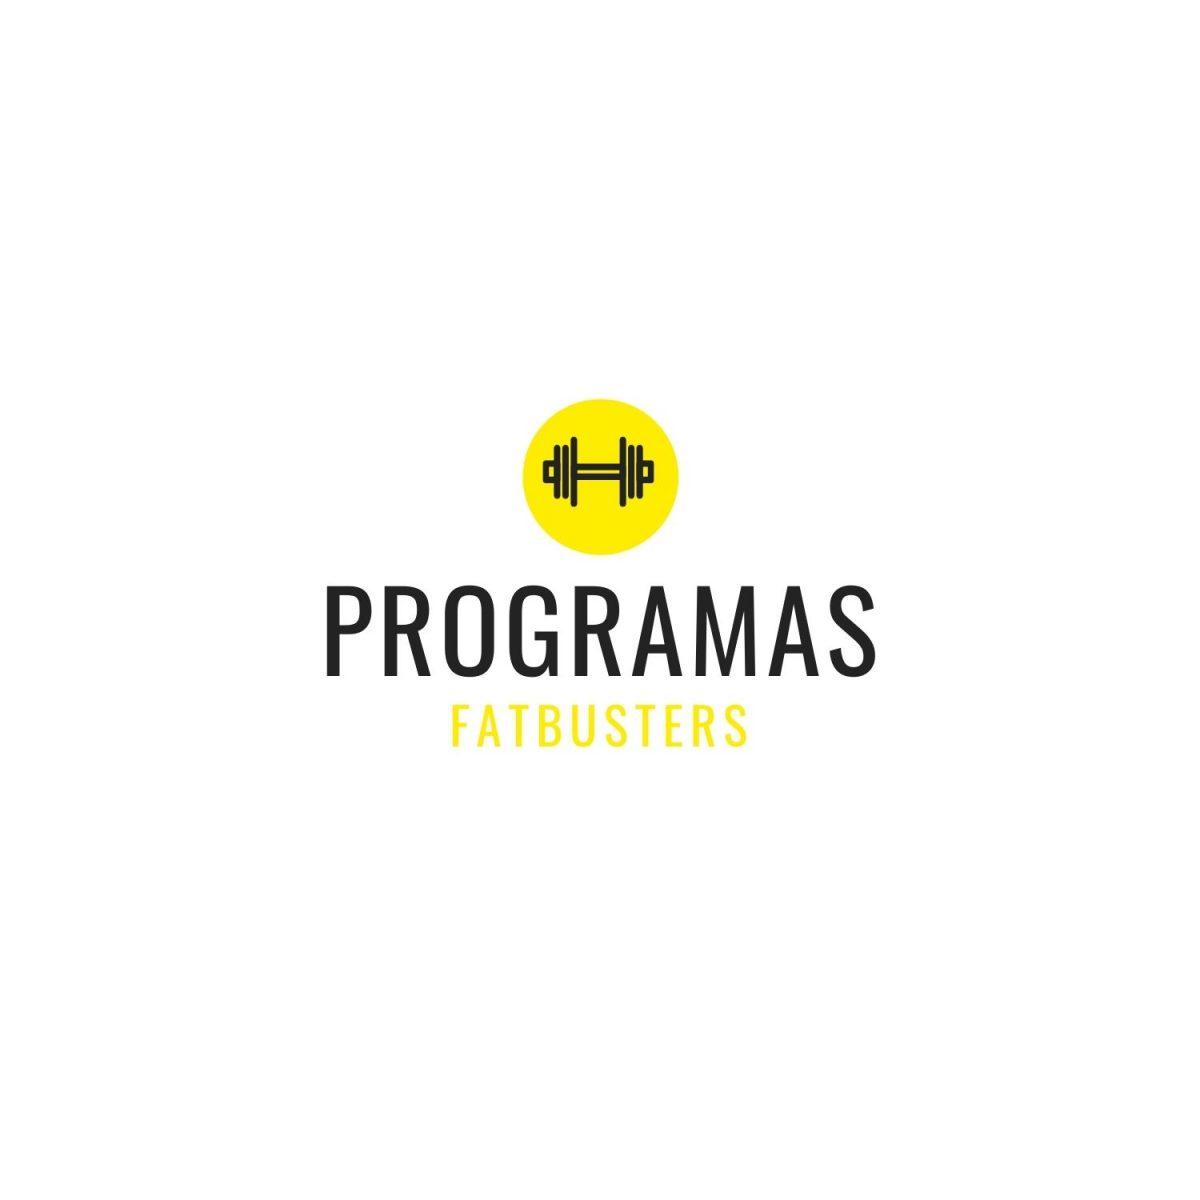 Programas Fatbusters